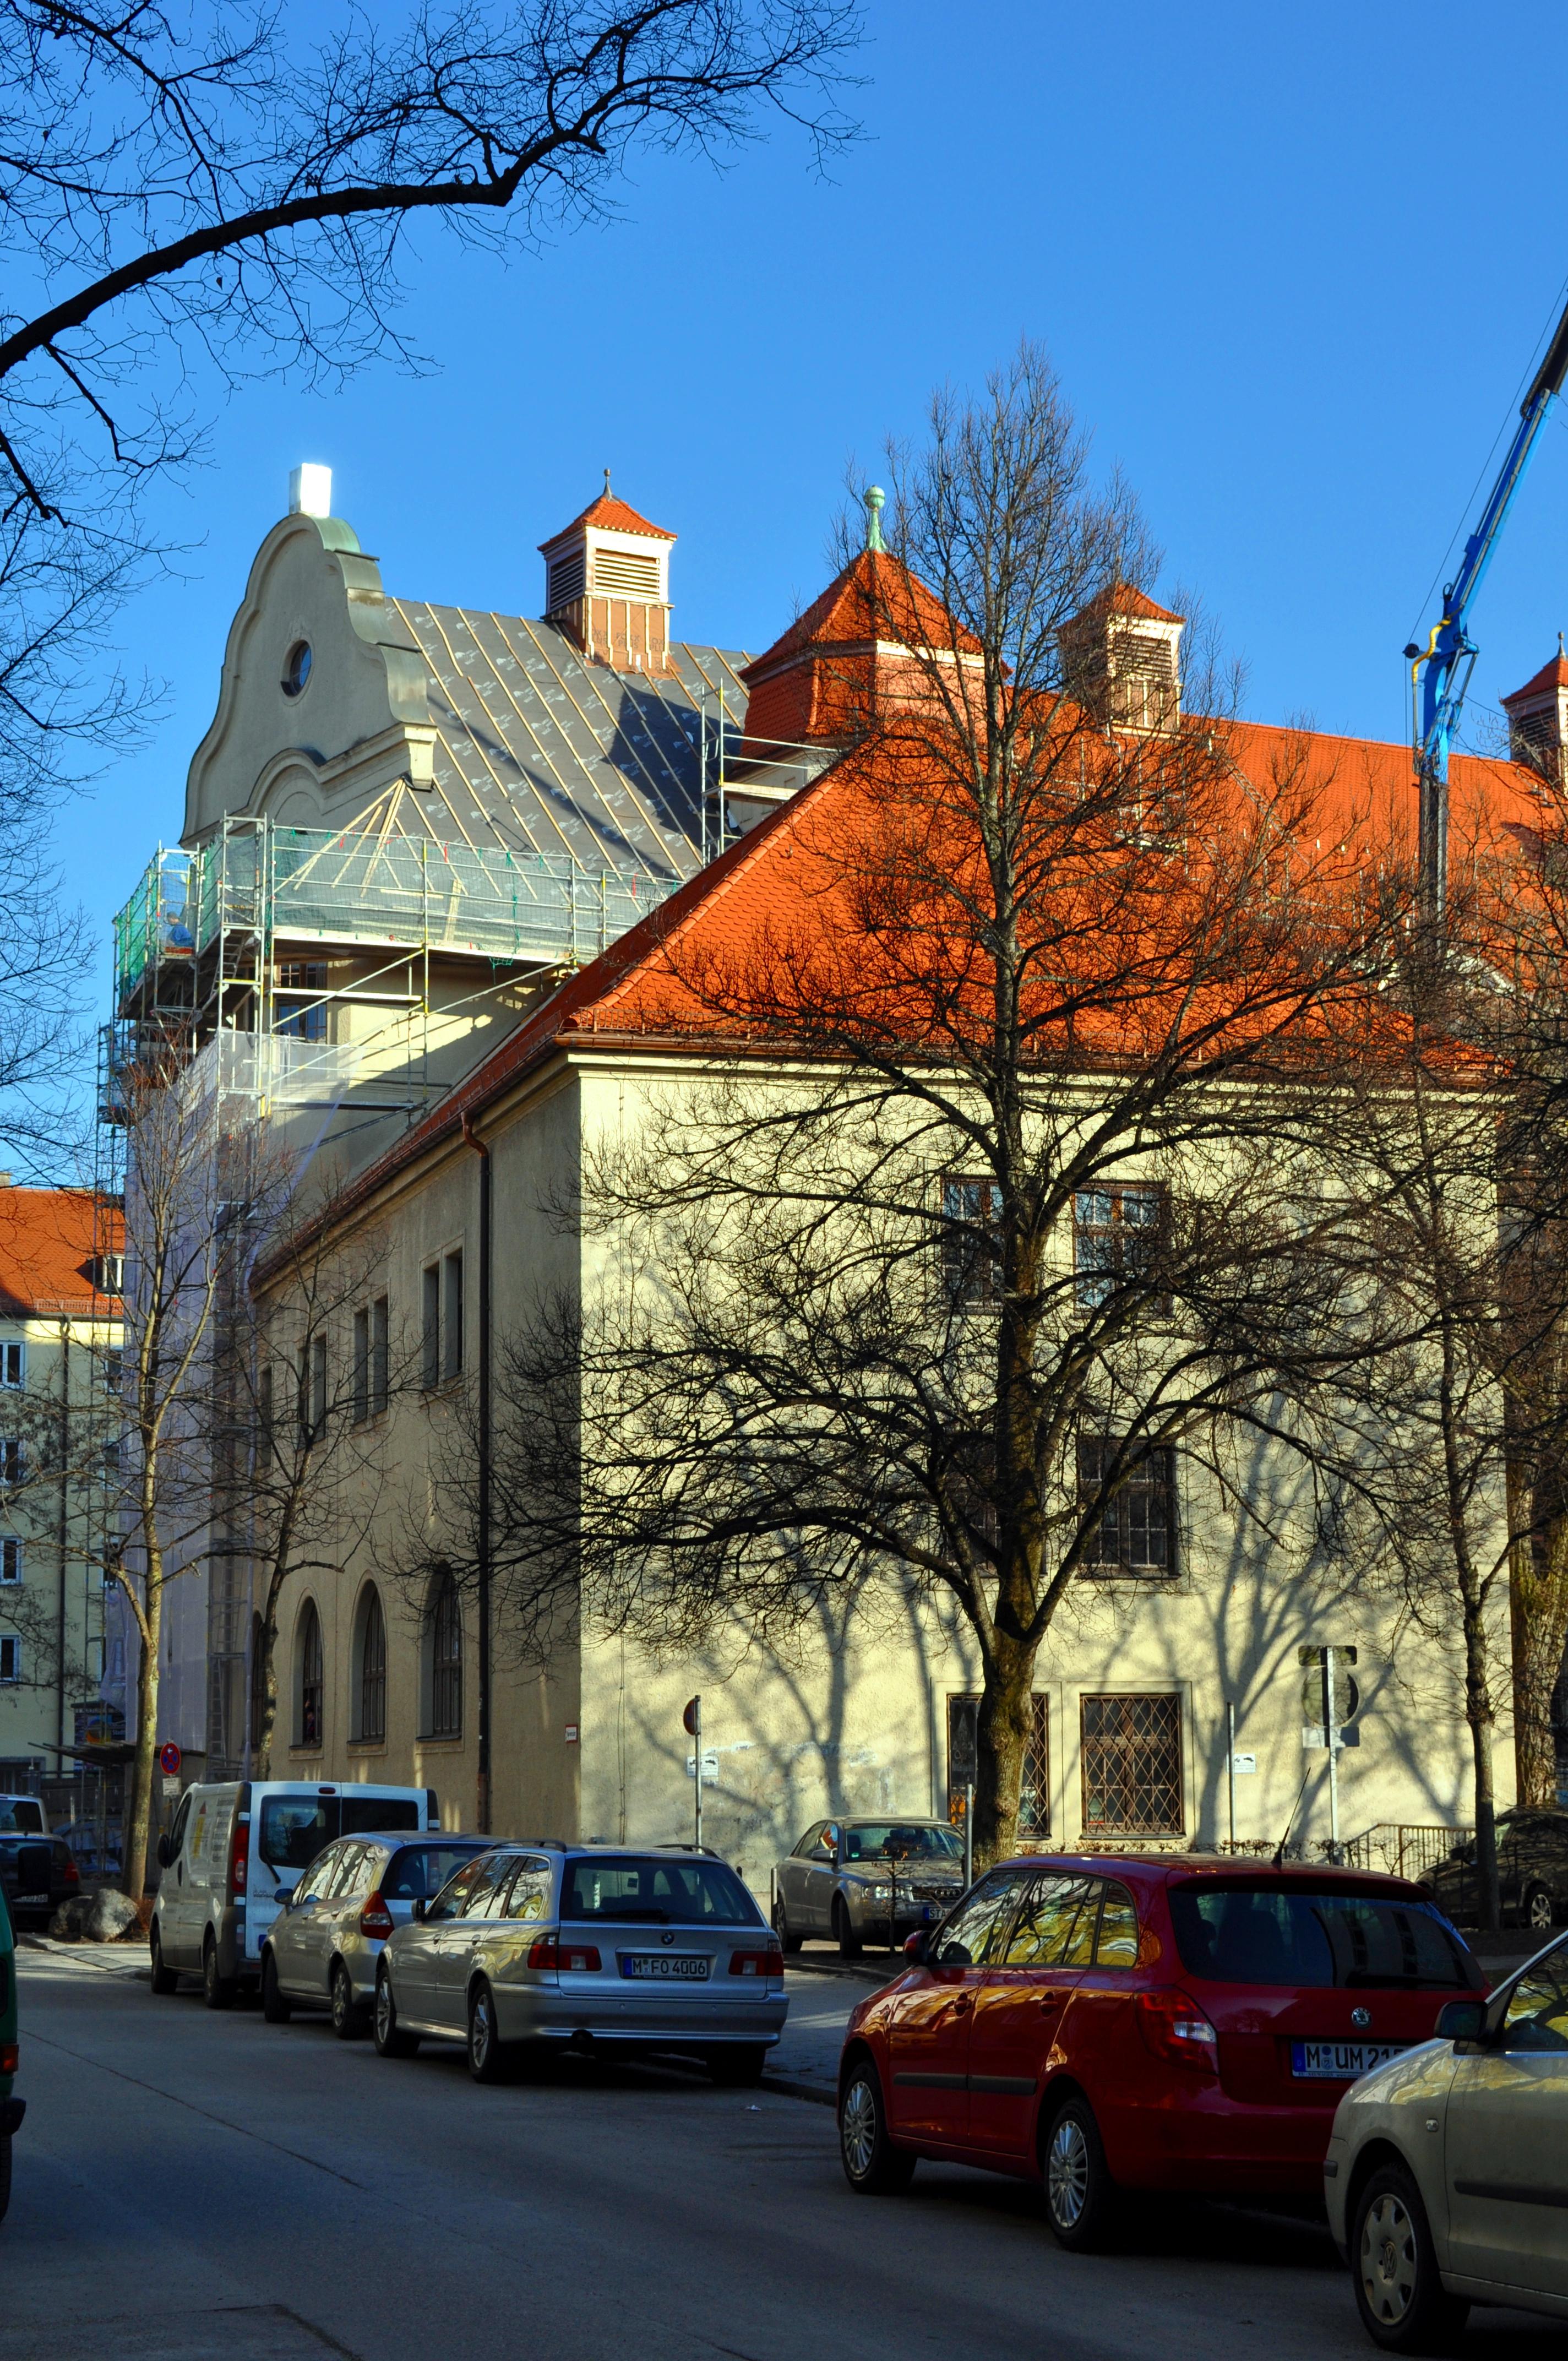 FileHermann Frieb Realschule Rckgebude 1JPG